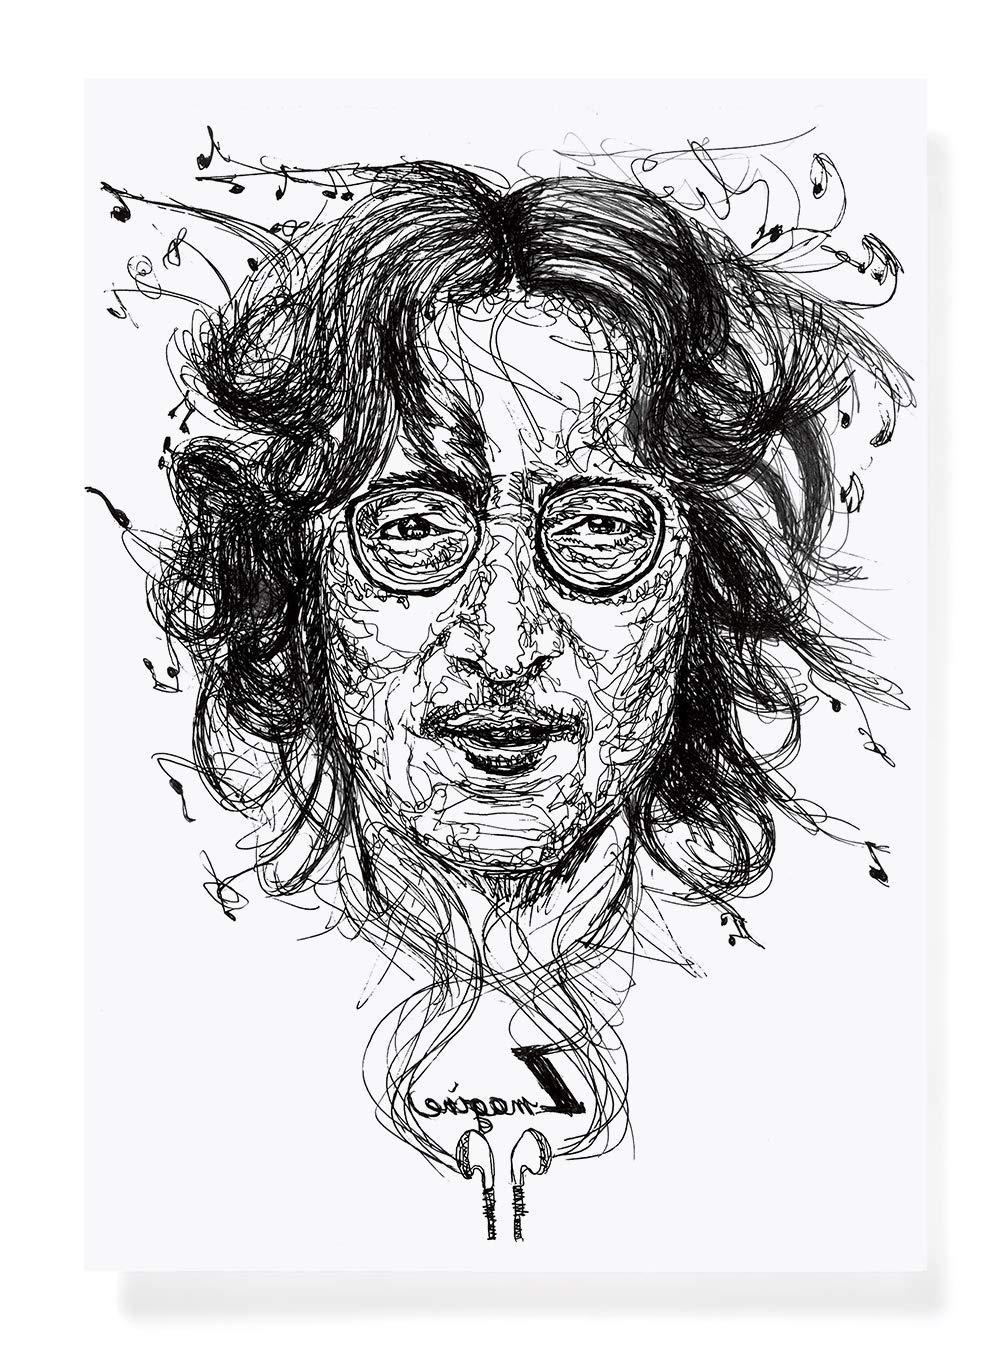 Amazon com christmas gift for music lover miss you john lennon portrait drawing a4 decor print black and white art beatles art wall decor